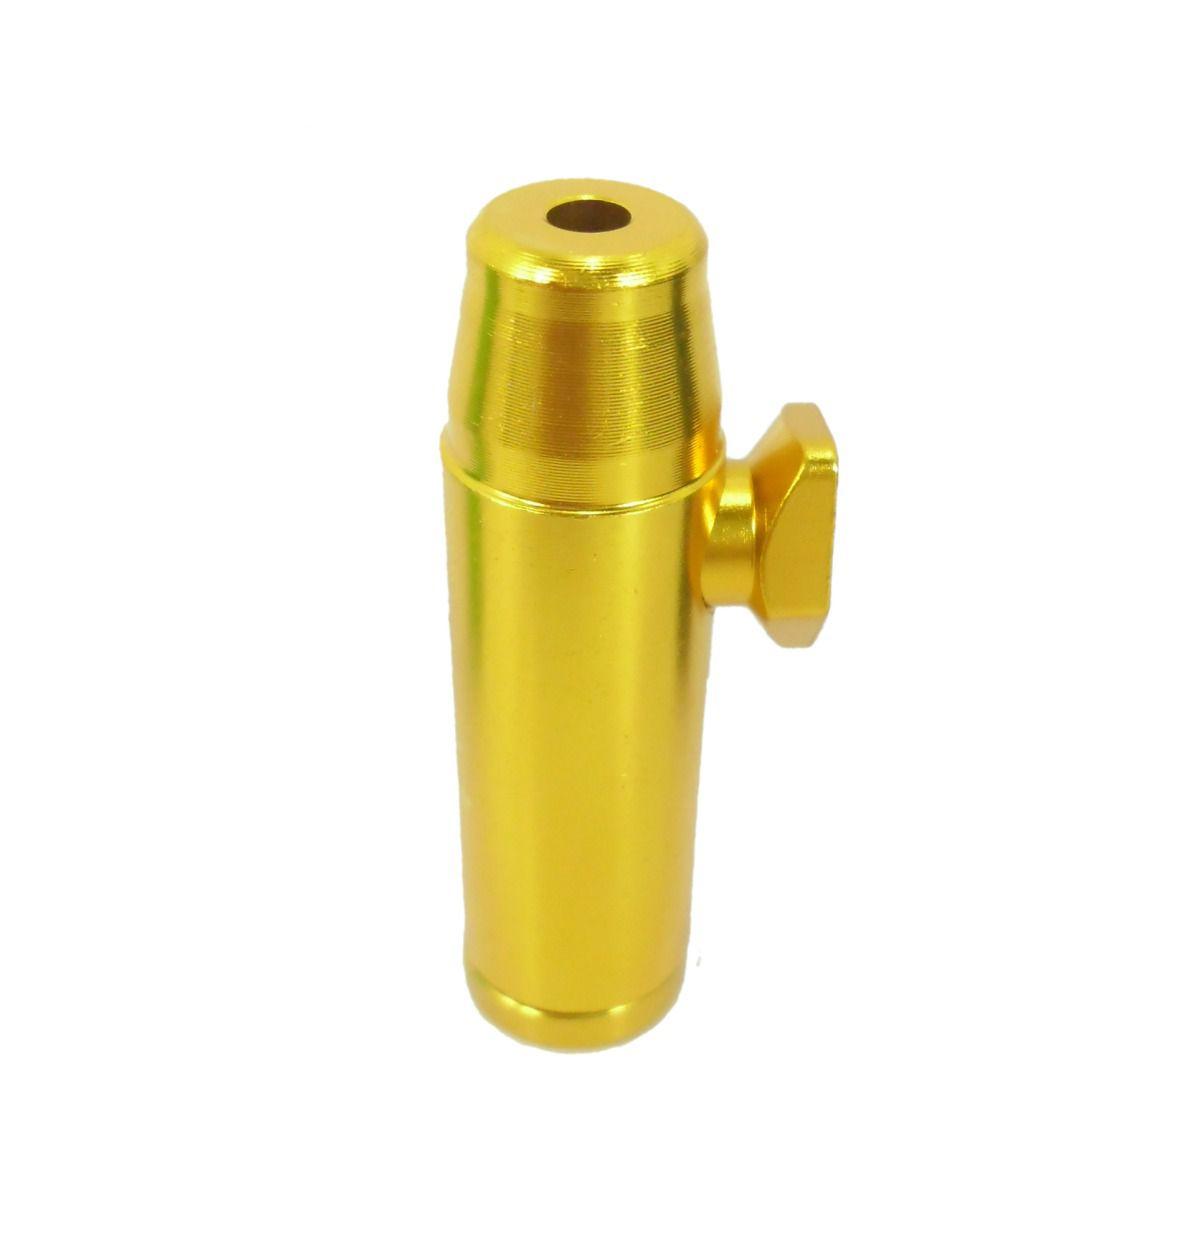 Dosador Snuff Bullet para rapé. Em Alumínio. 5,2cm de altura.